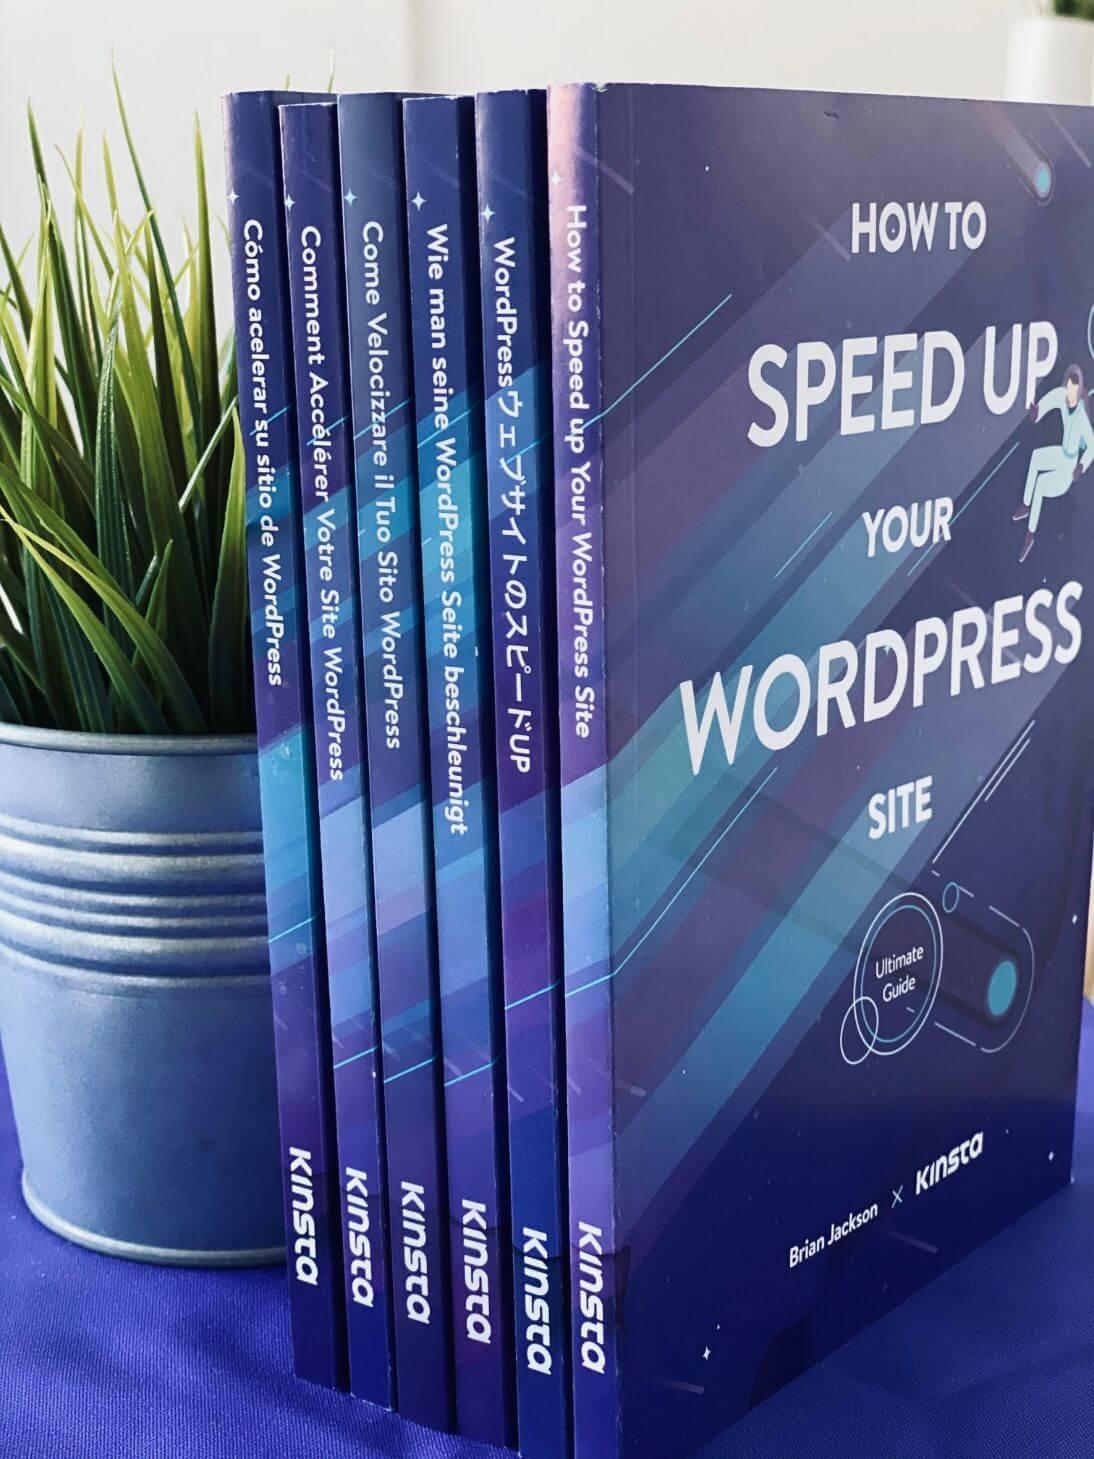 「WordPressウェブサイトのスピードアップについて」の本